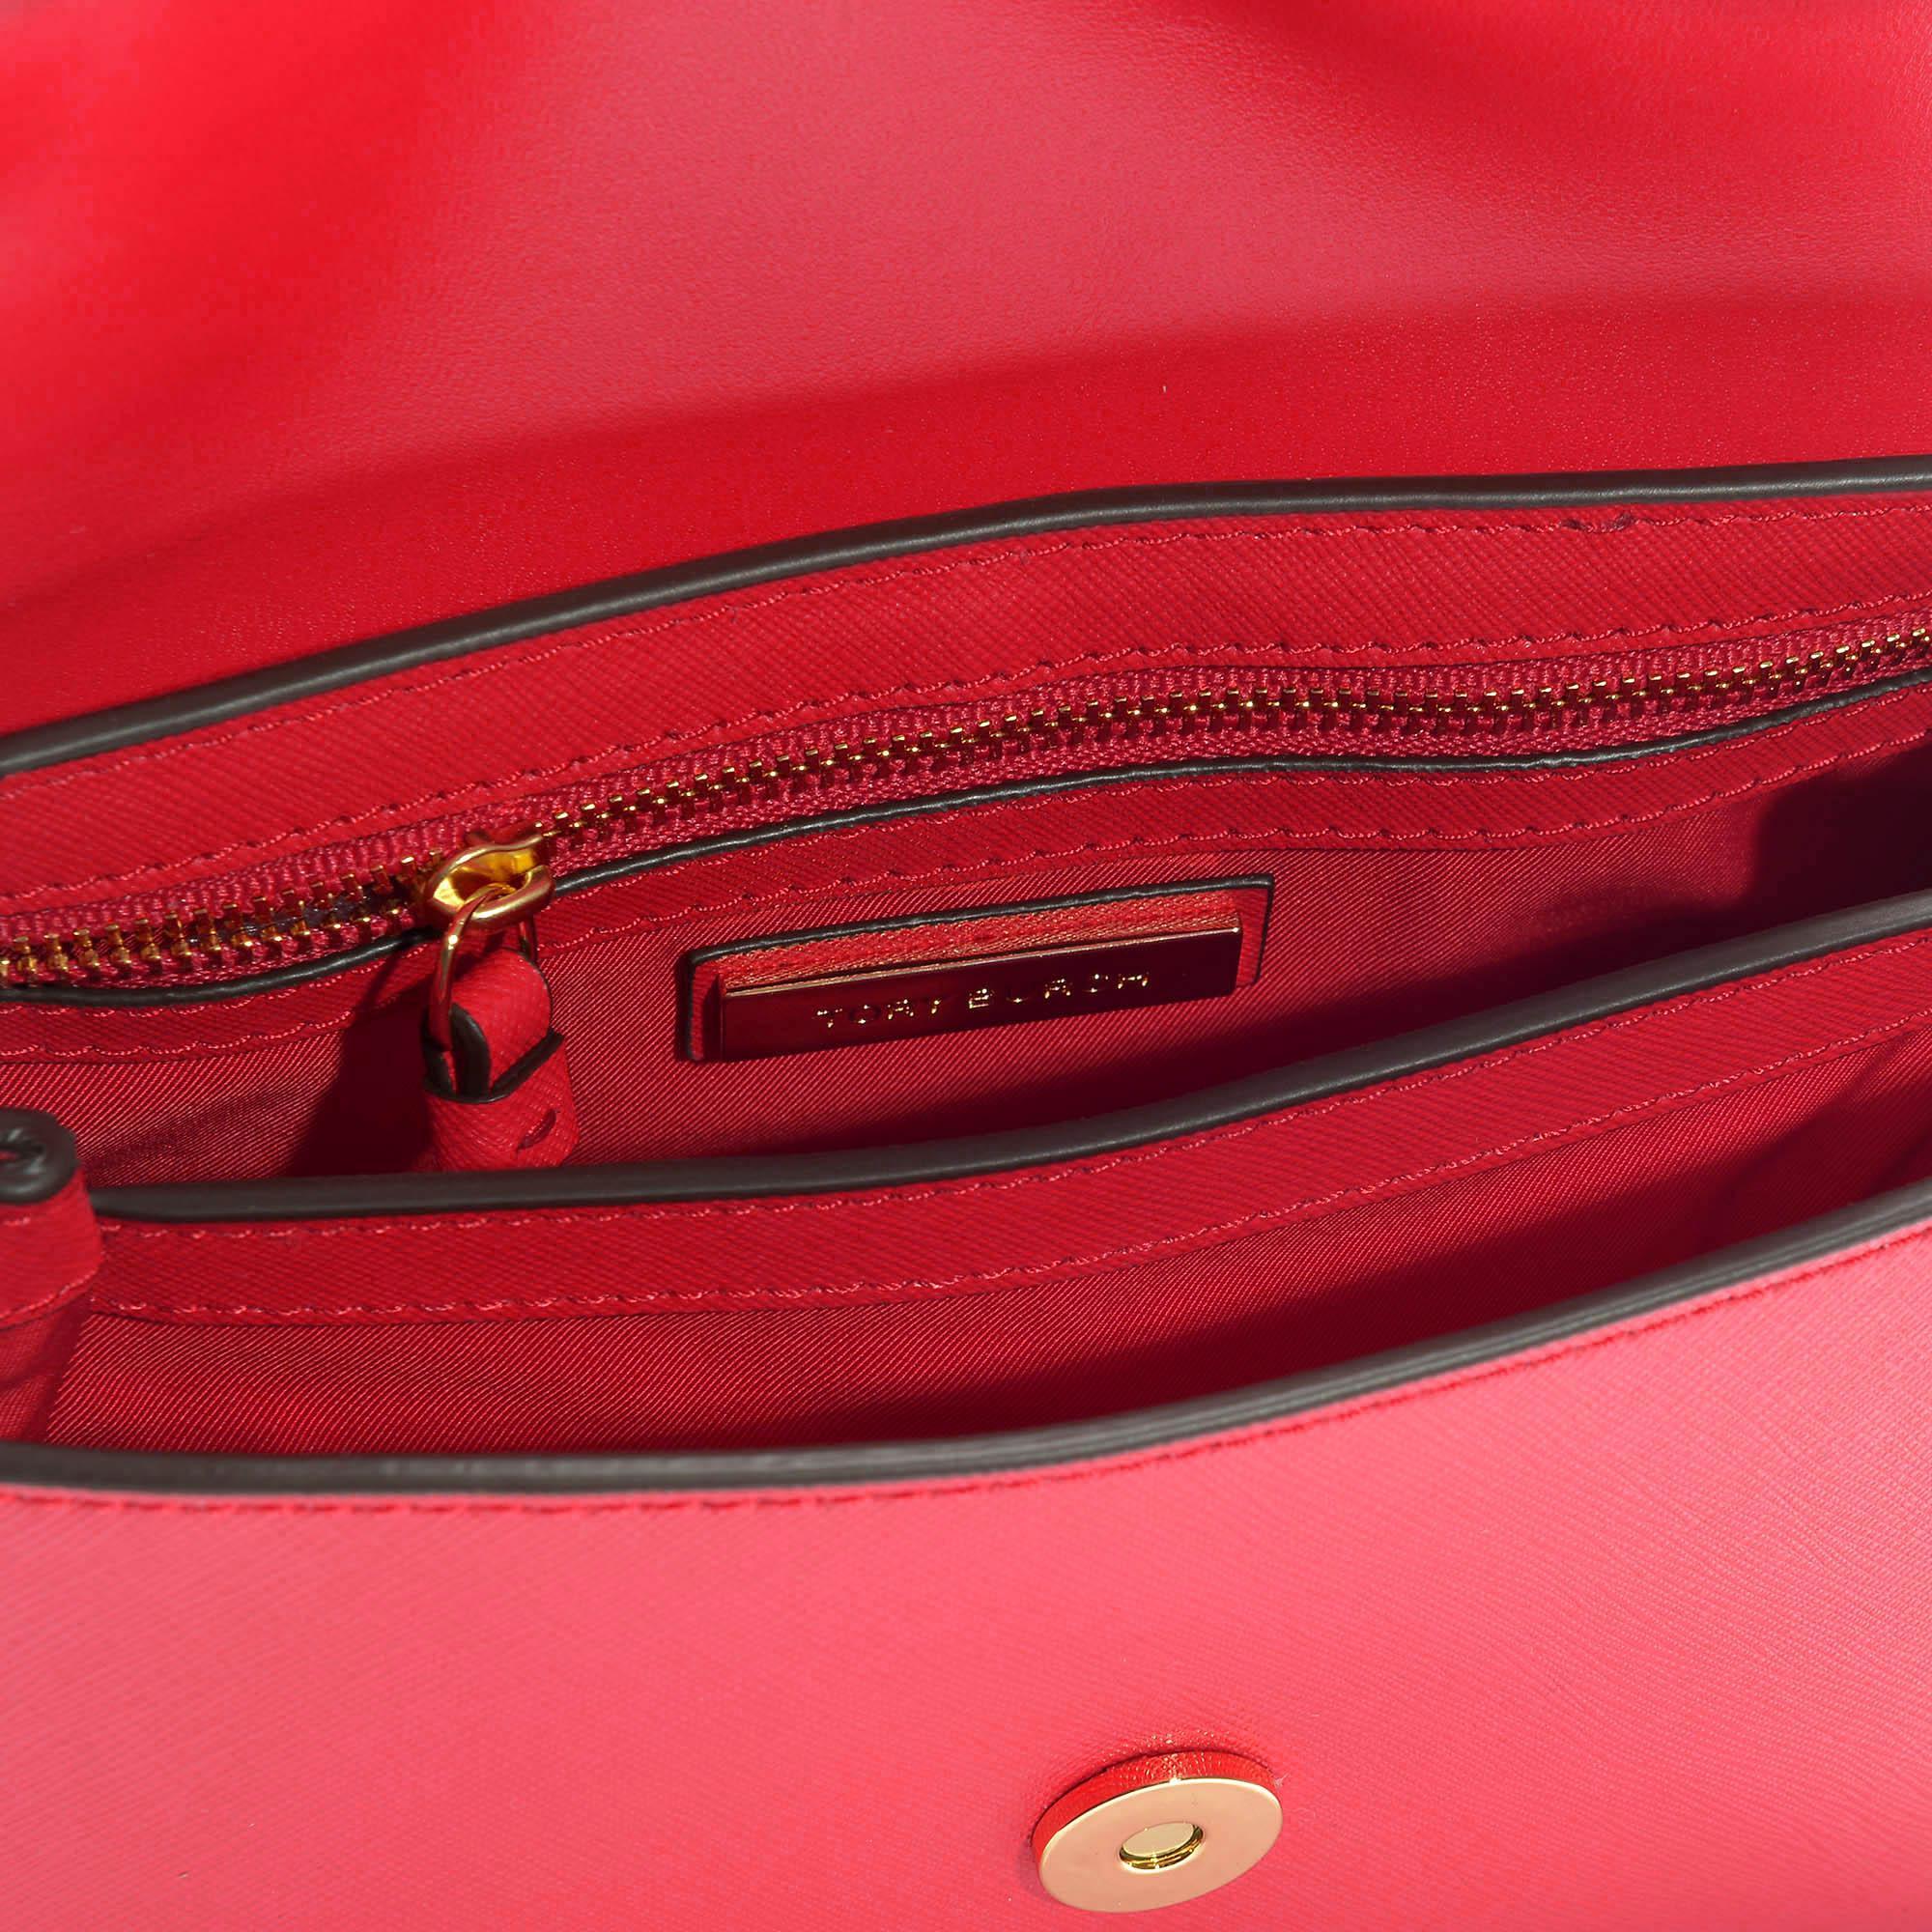 d981feff4a06 Tory Burch - Robinson Small Top-handle Satchel In Brilliant Red Calfskin -  Lyst. View fullscreen